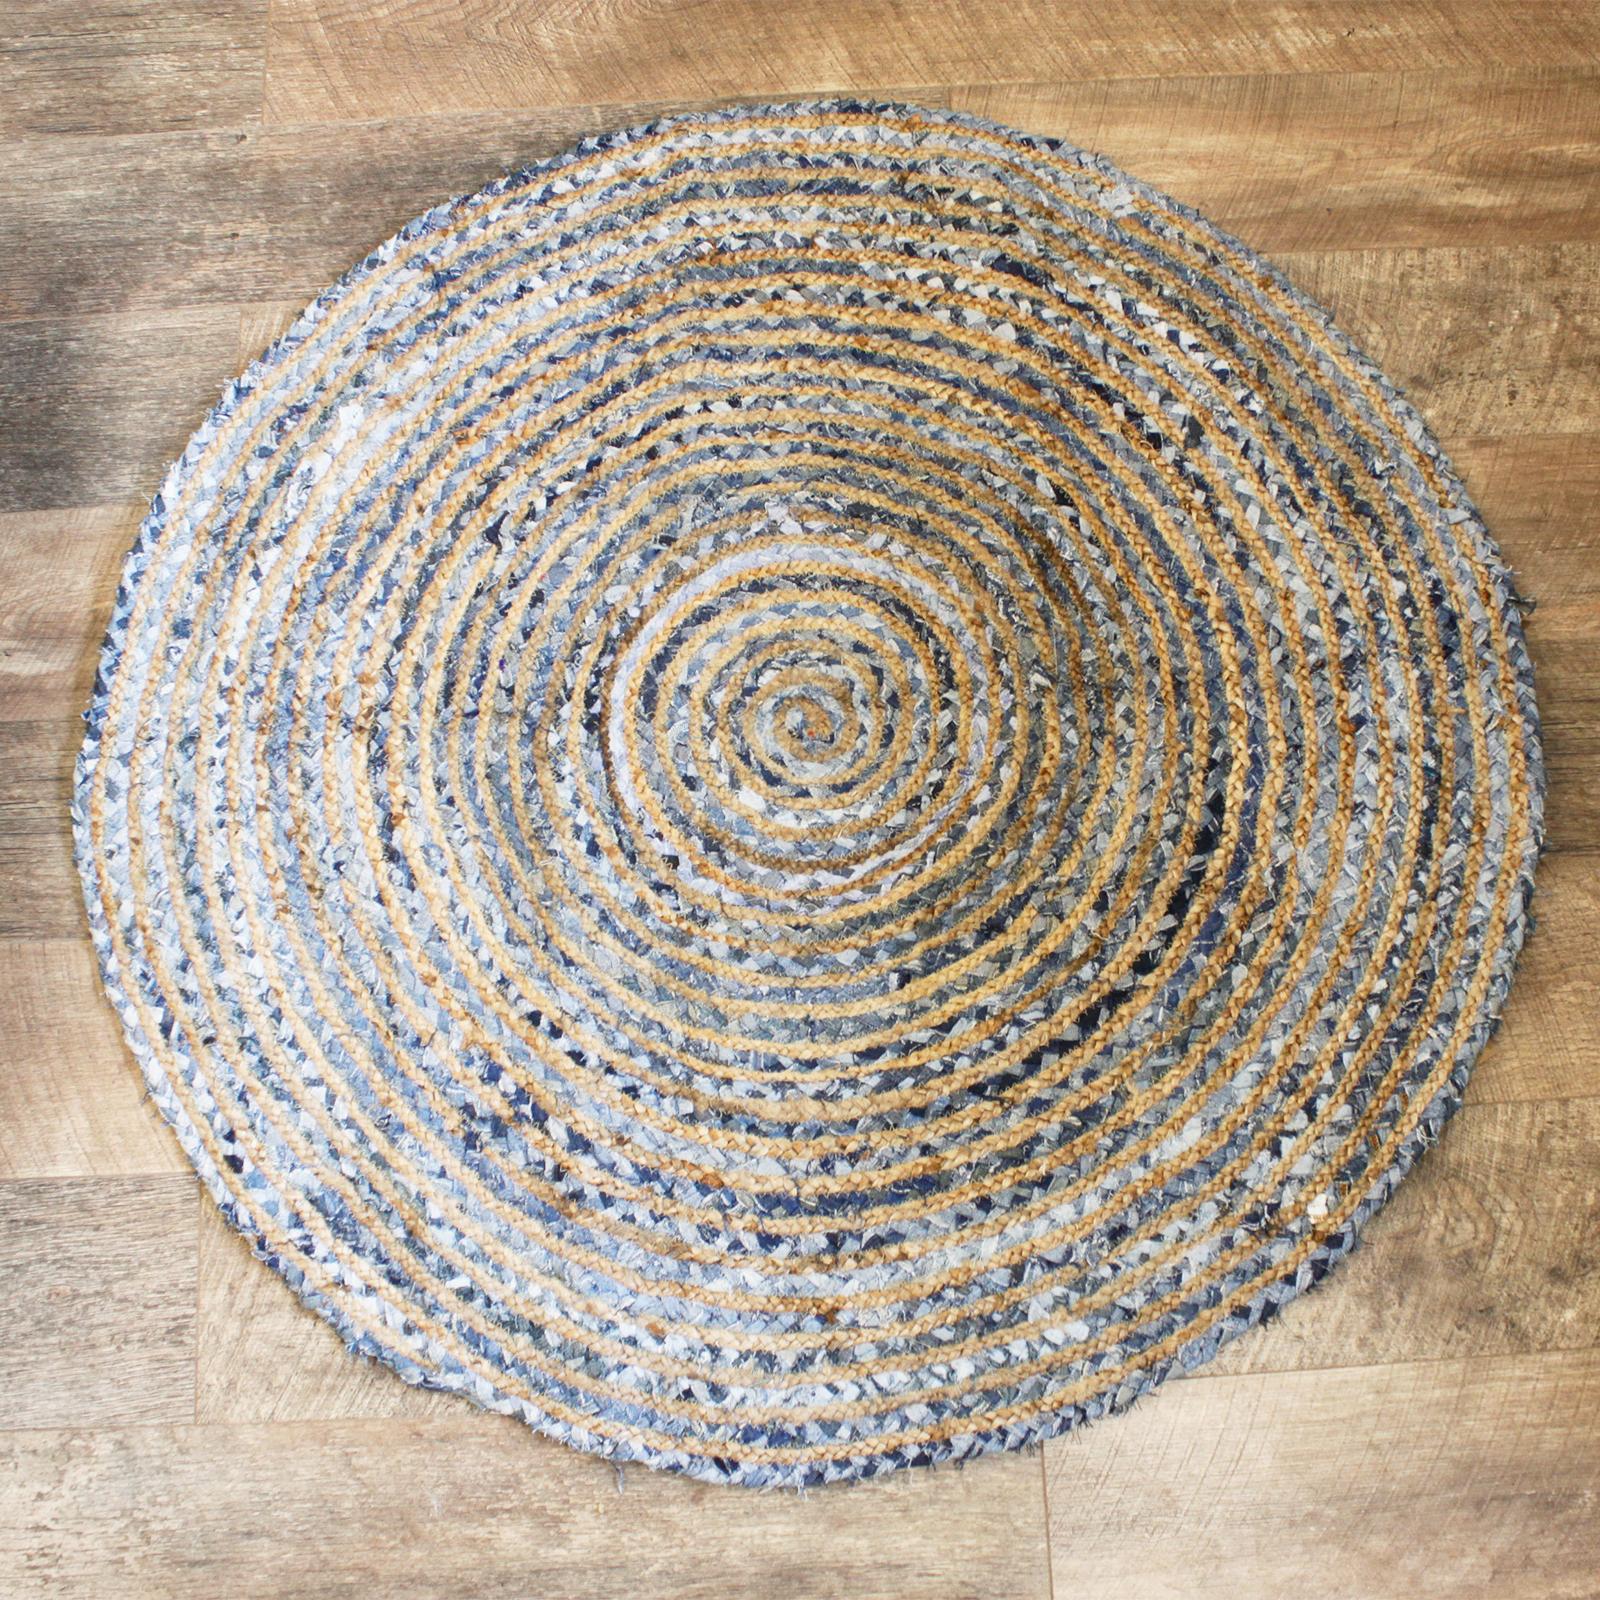 Round Jute and Recycle Denim Rug 120 cm